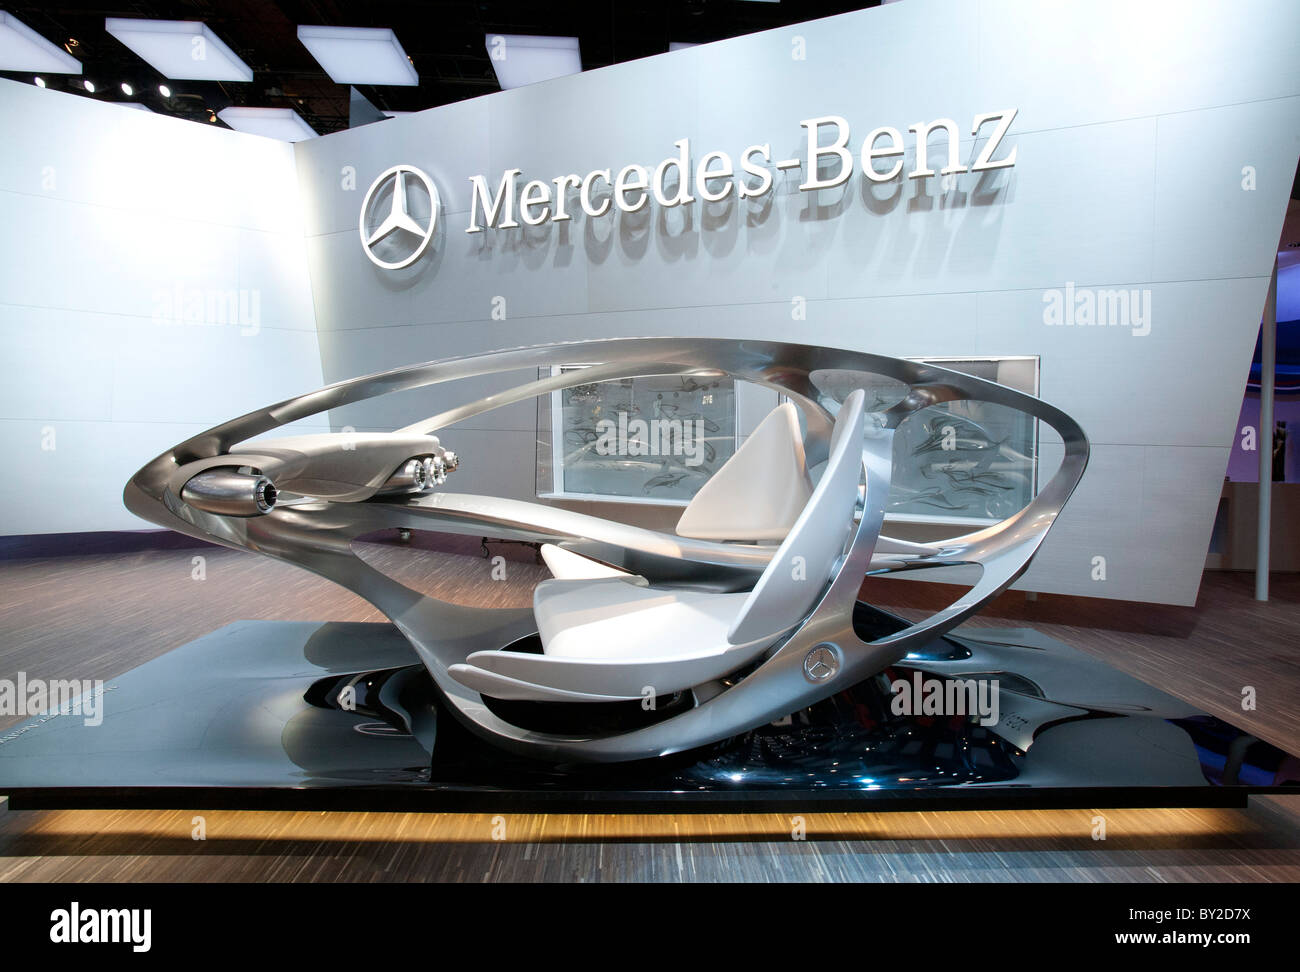 Detroit, Michigan - Mercedes-Benz estetica n. 2 scultura su display al North American International Auto Show. Immagini Stock